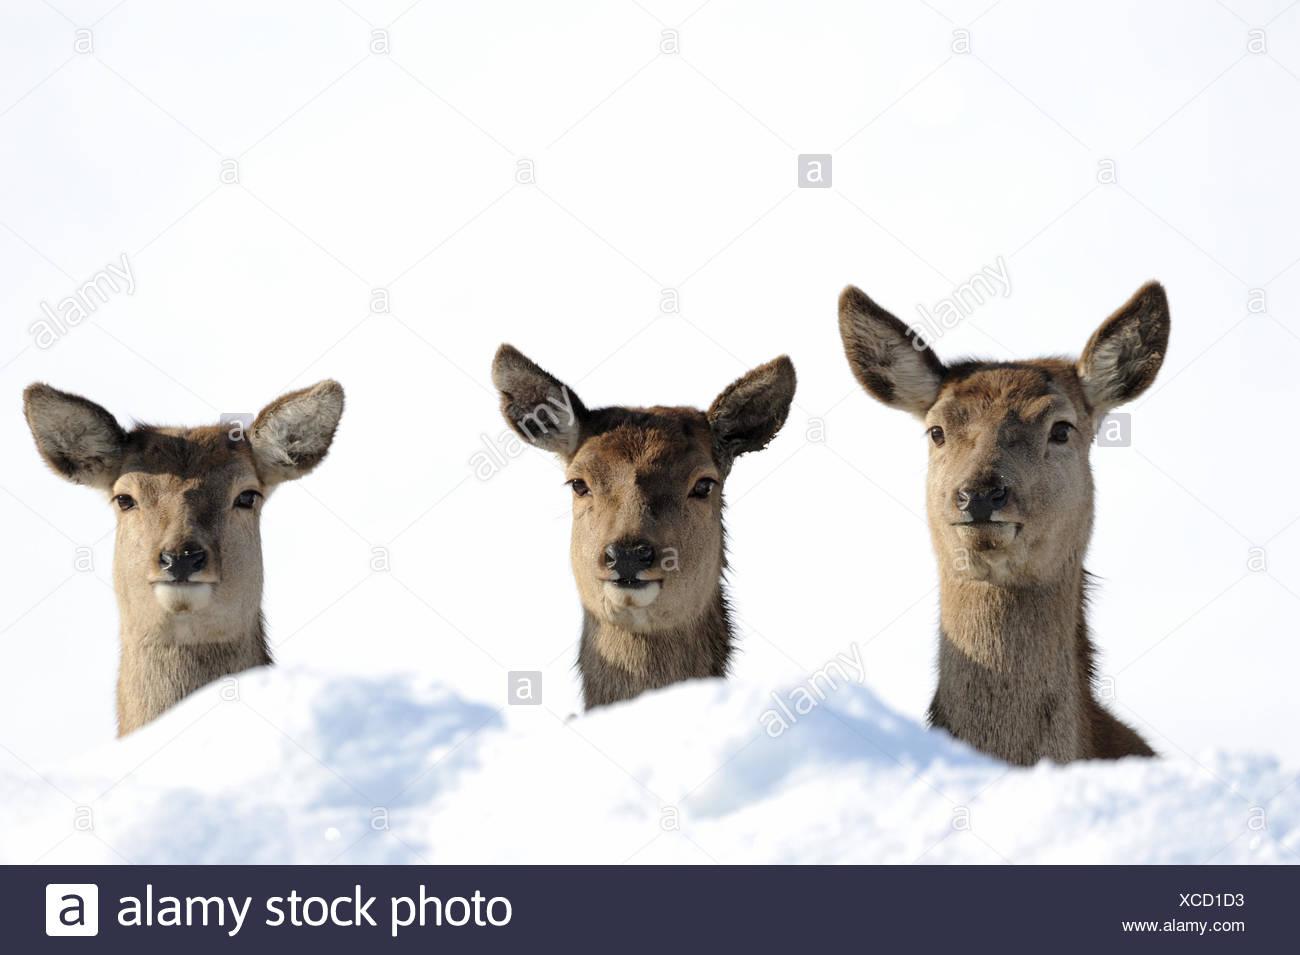 Red deer antlers antler Cervid Cervus elaphus deer stag stags hoofed animals summers velvet autumn snow animal animals Germ - Stock Image